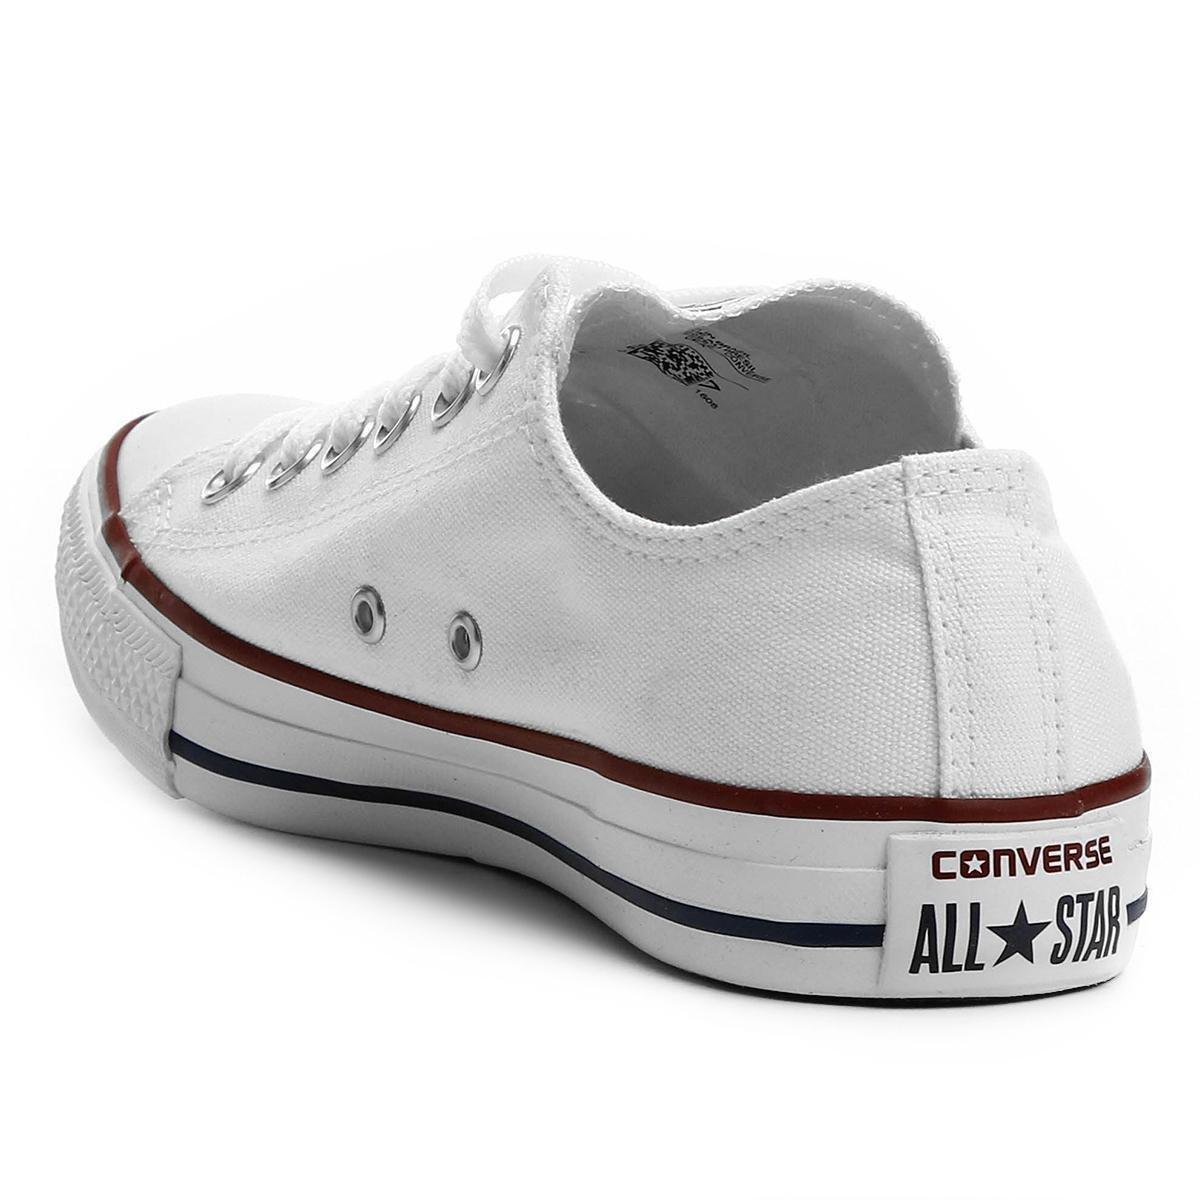 Tênis Converse All Star As Core Ox infantil